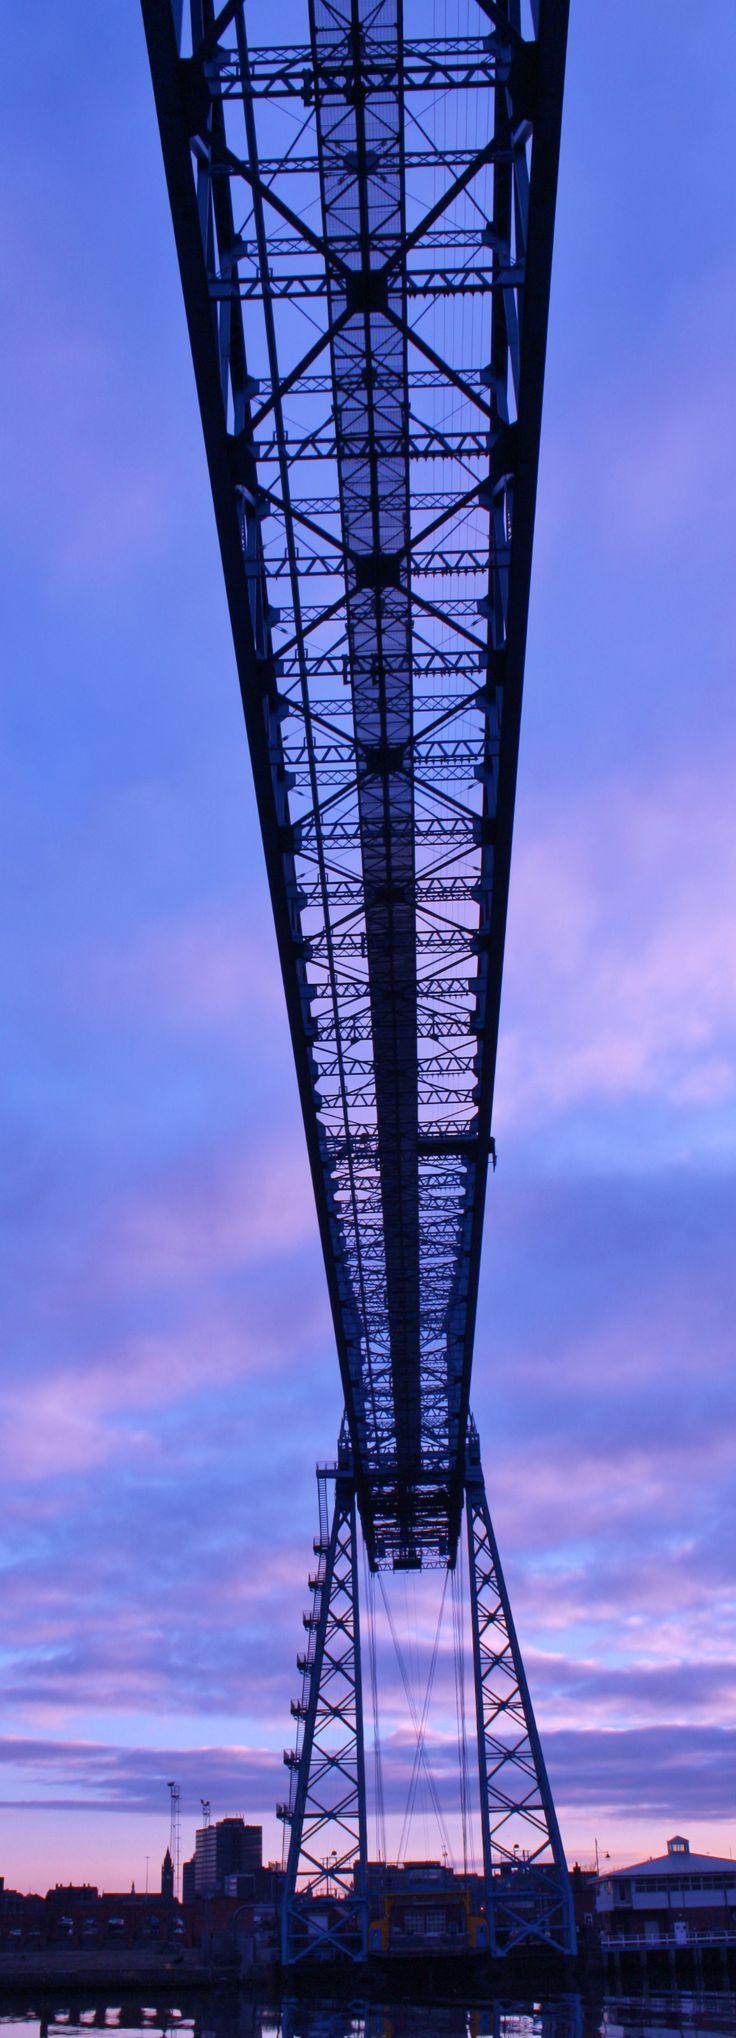 The Transporter Bridge Middlesbrough by Dawn Ryder